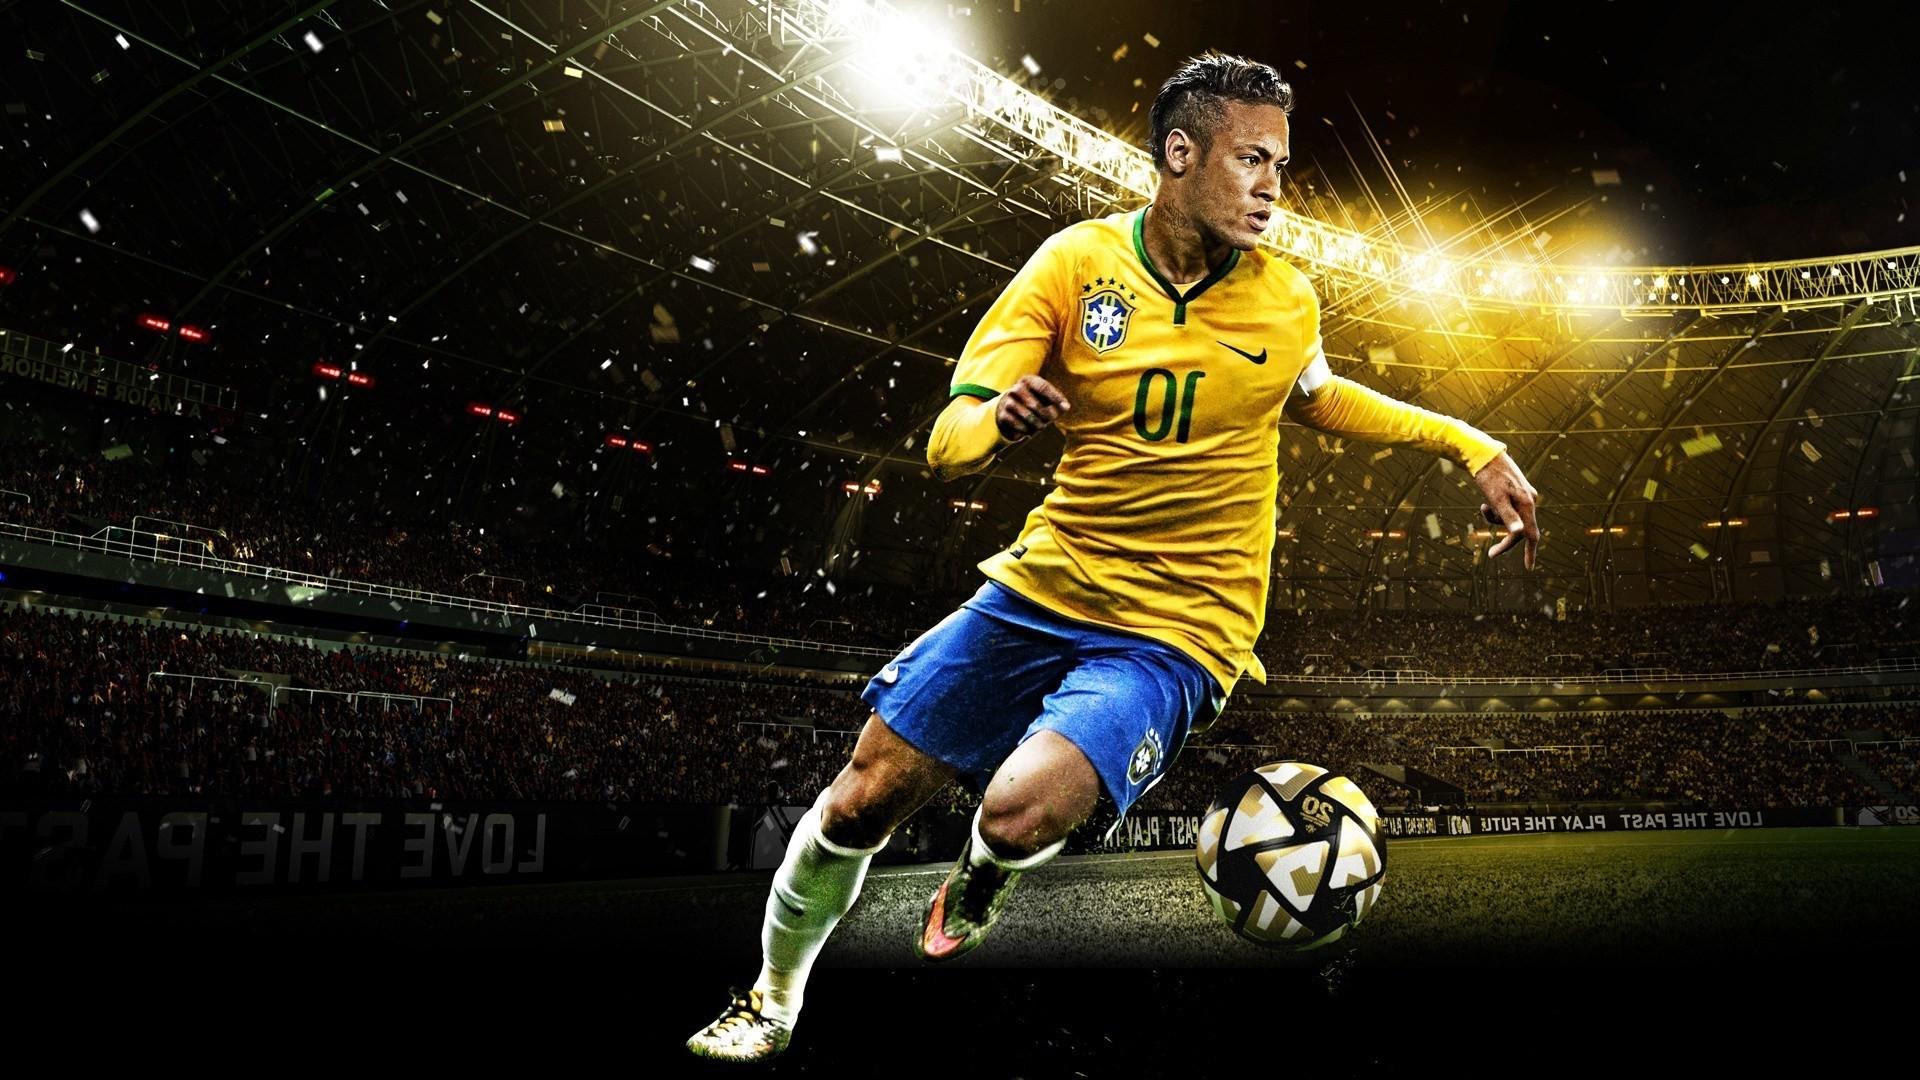 Neymar wallpaper hd 2018 82 images - Neymar brazil hd ...